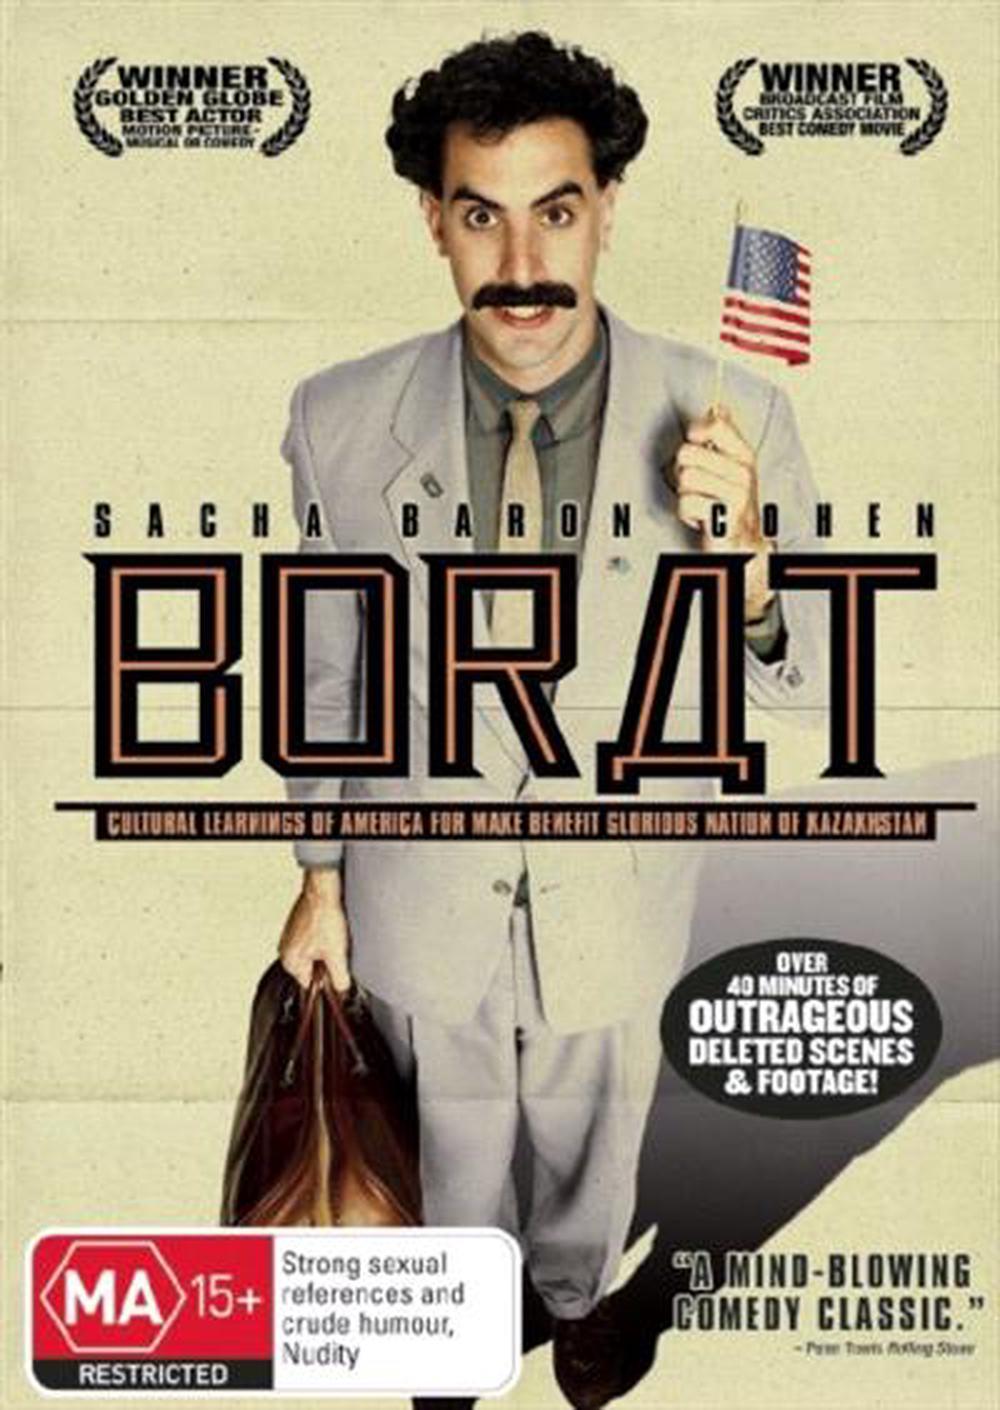 borat cultural learnings of